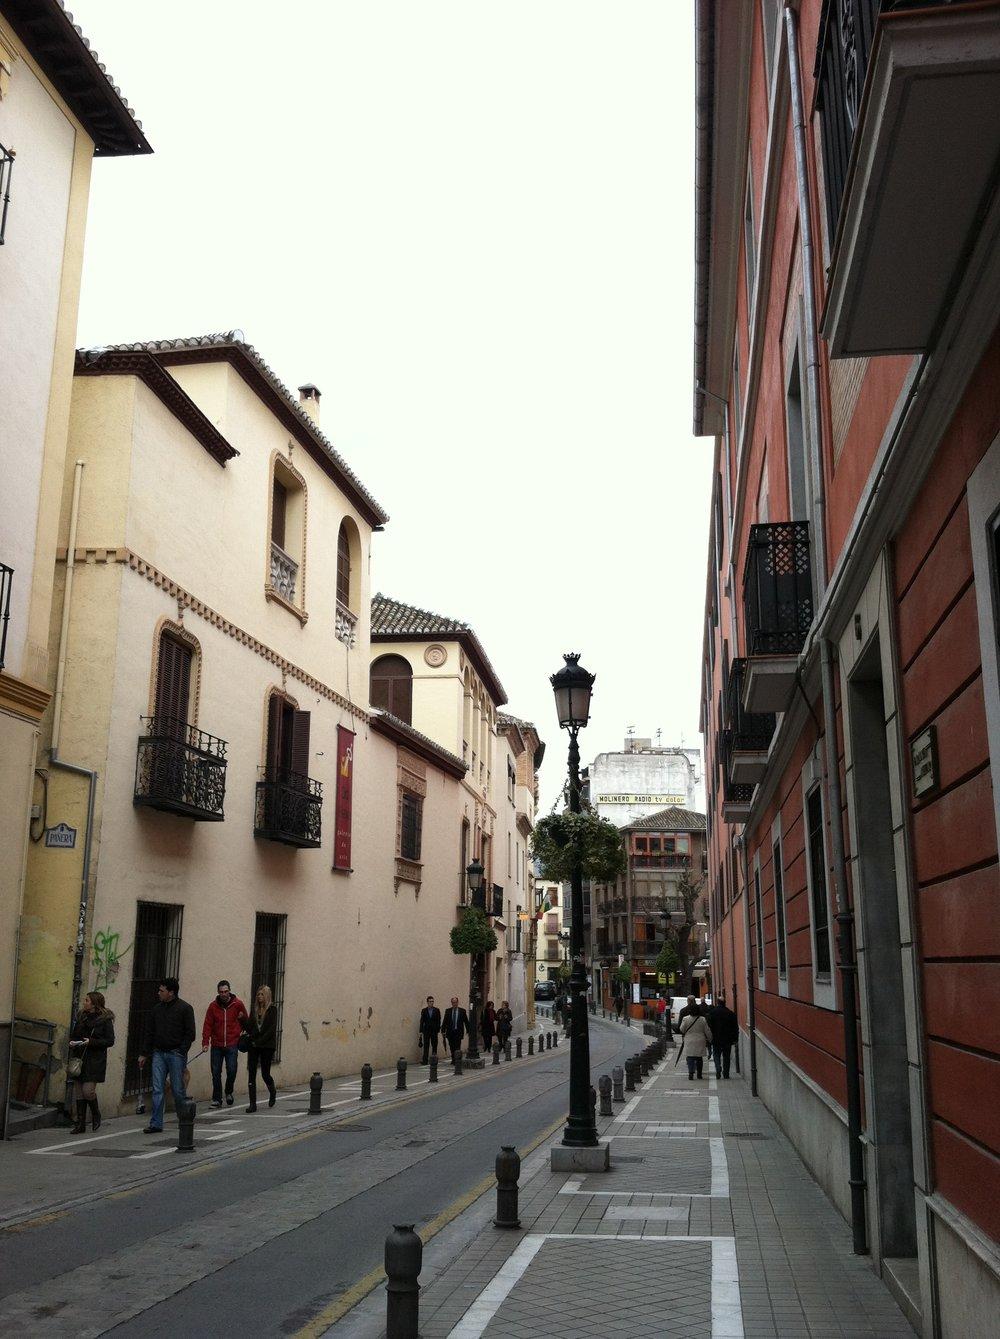 A pretty normal street in Granada, Spain. (Photo: Jordan Clark)